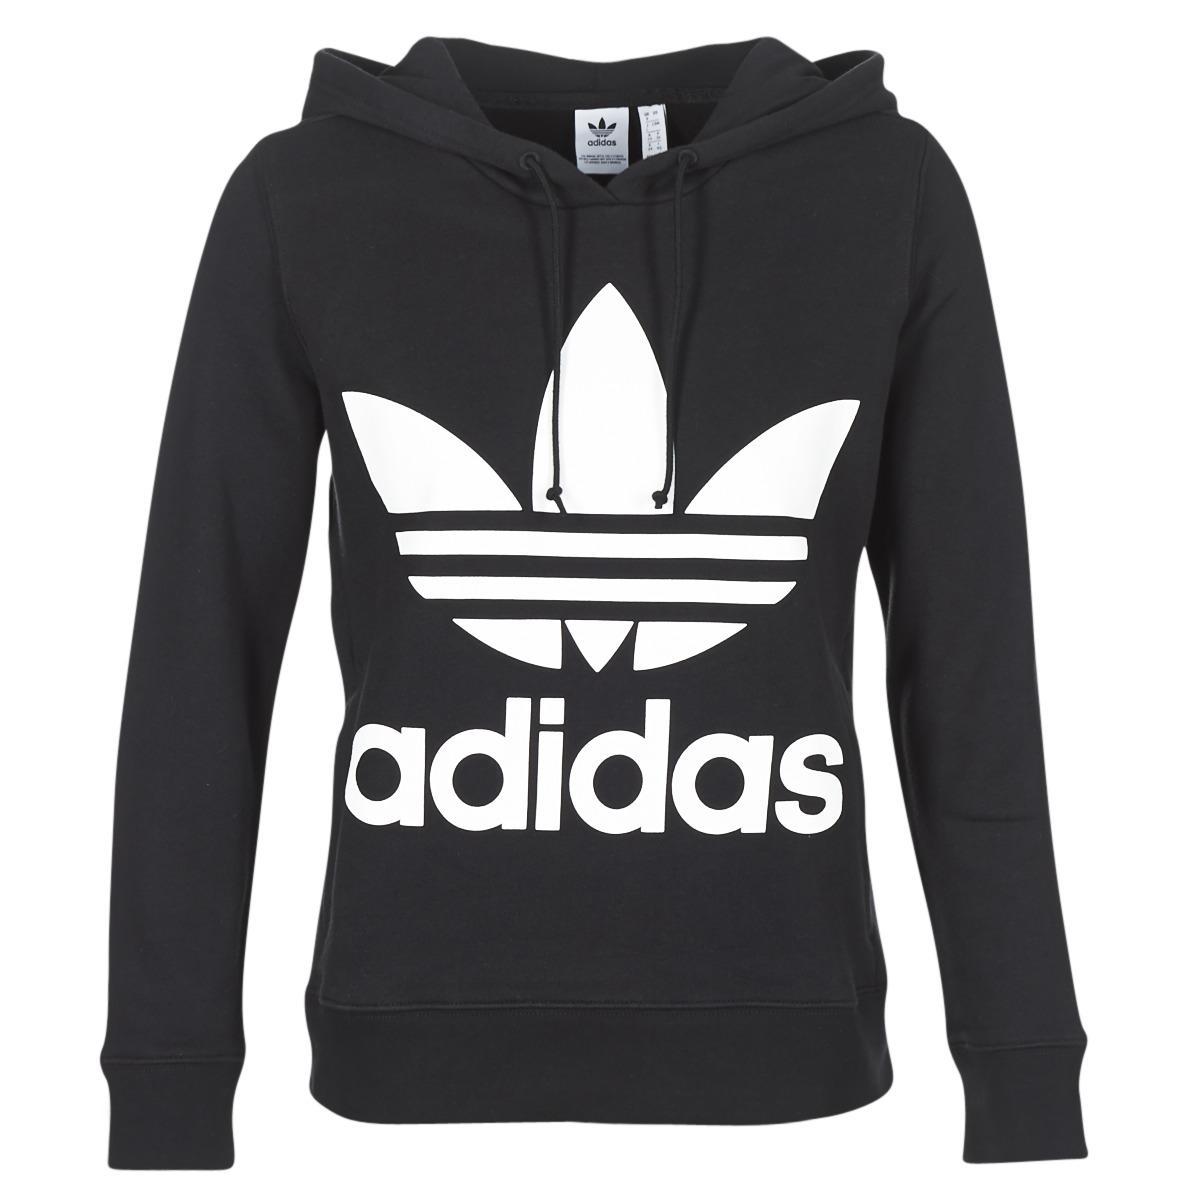 29f4fd261bce7 Adidas - Black Trefoil Hoodie Sweatshirt - Lyst. View fullscreen